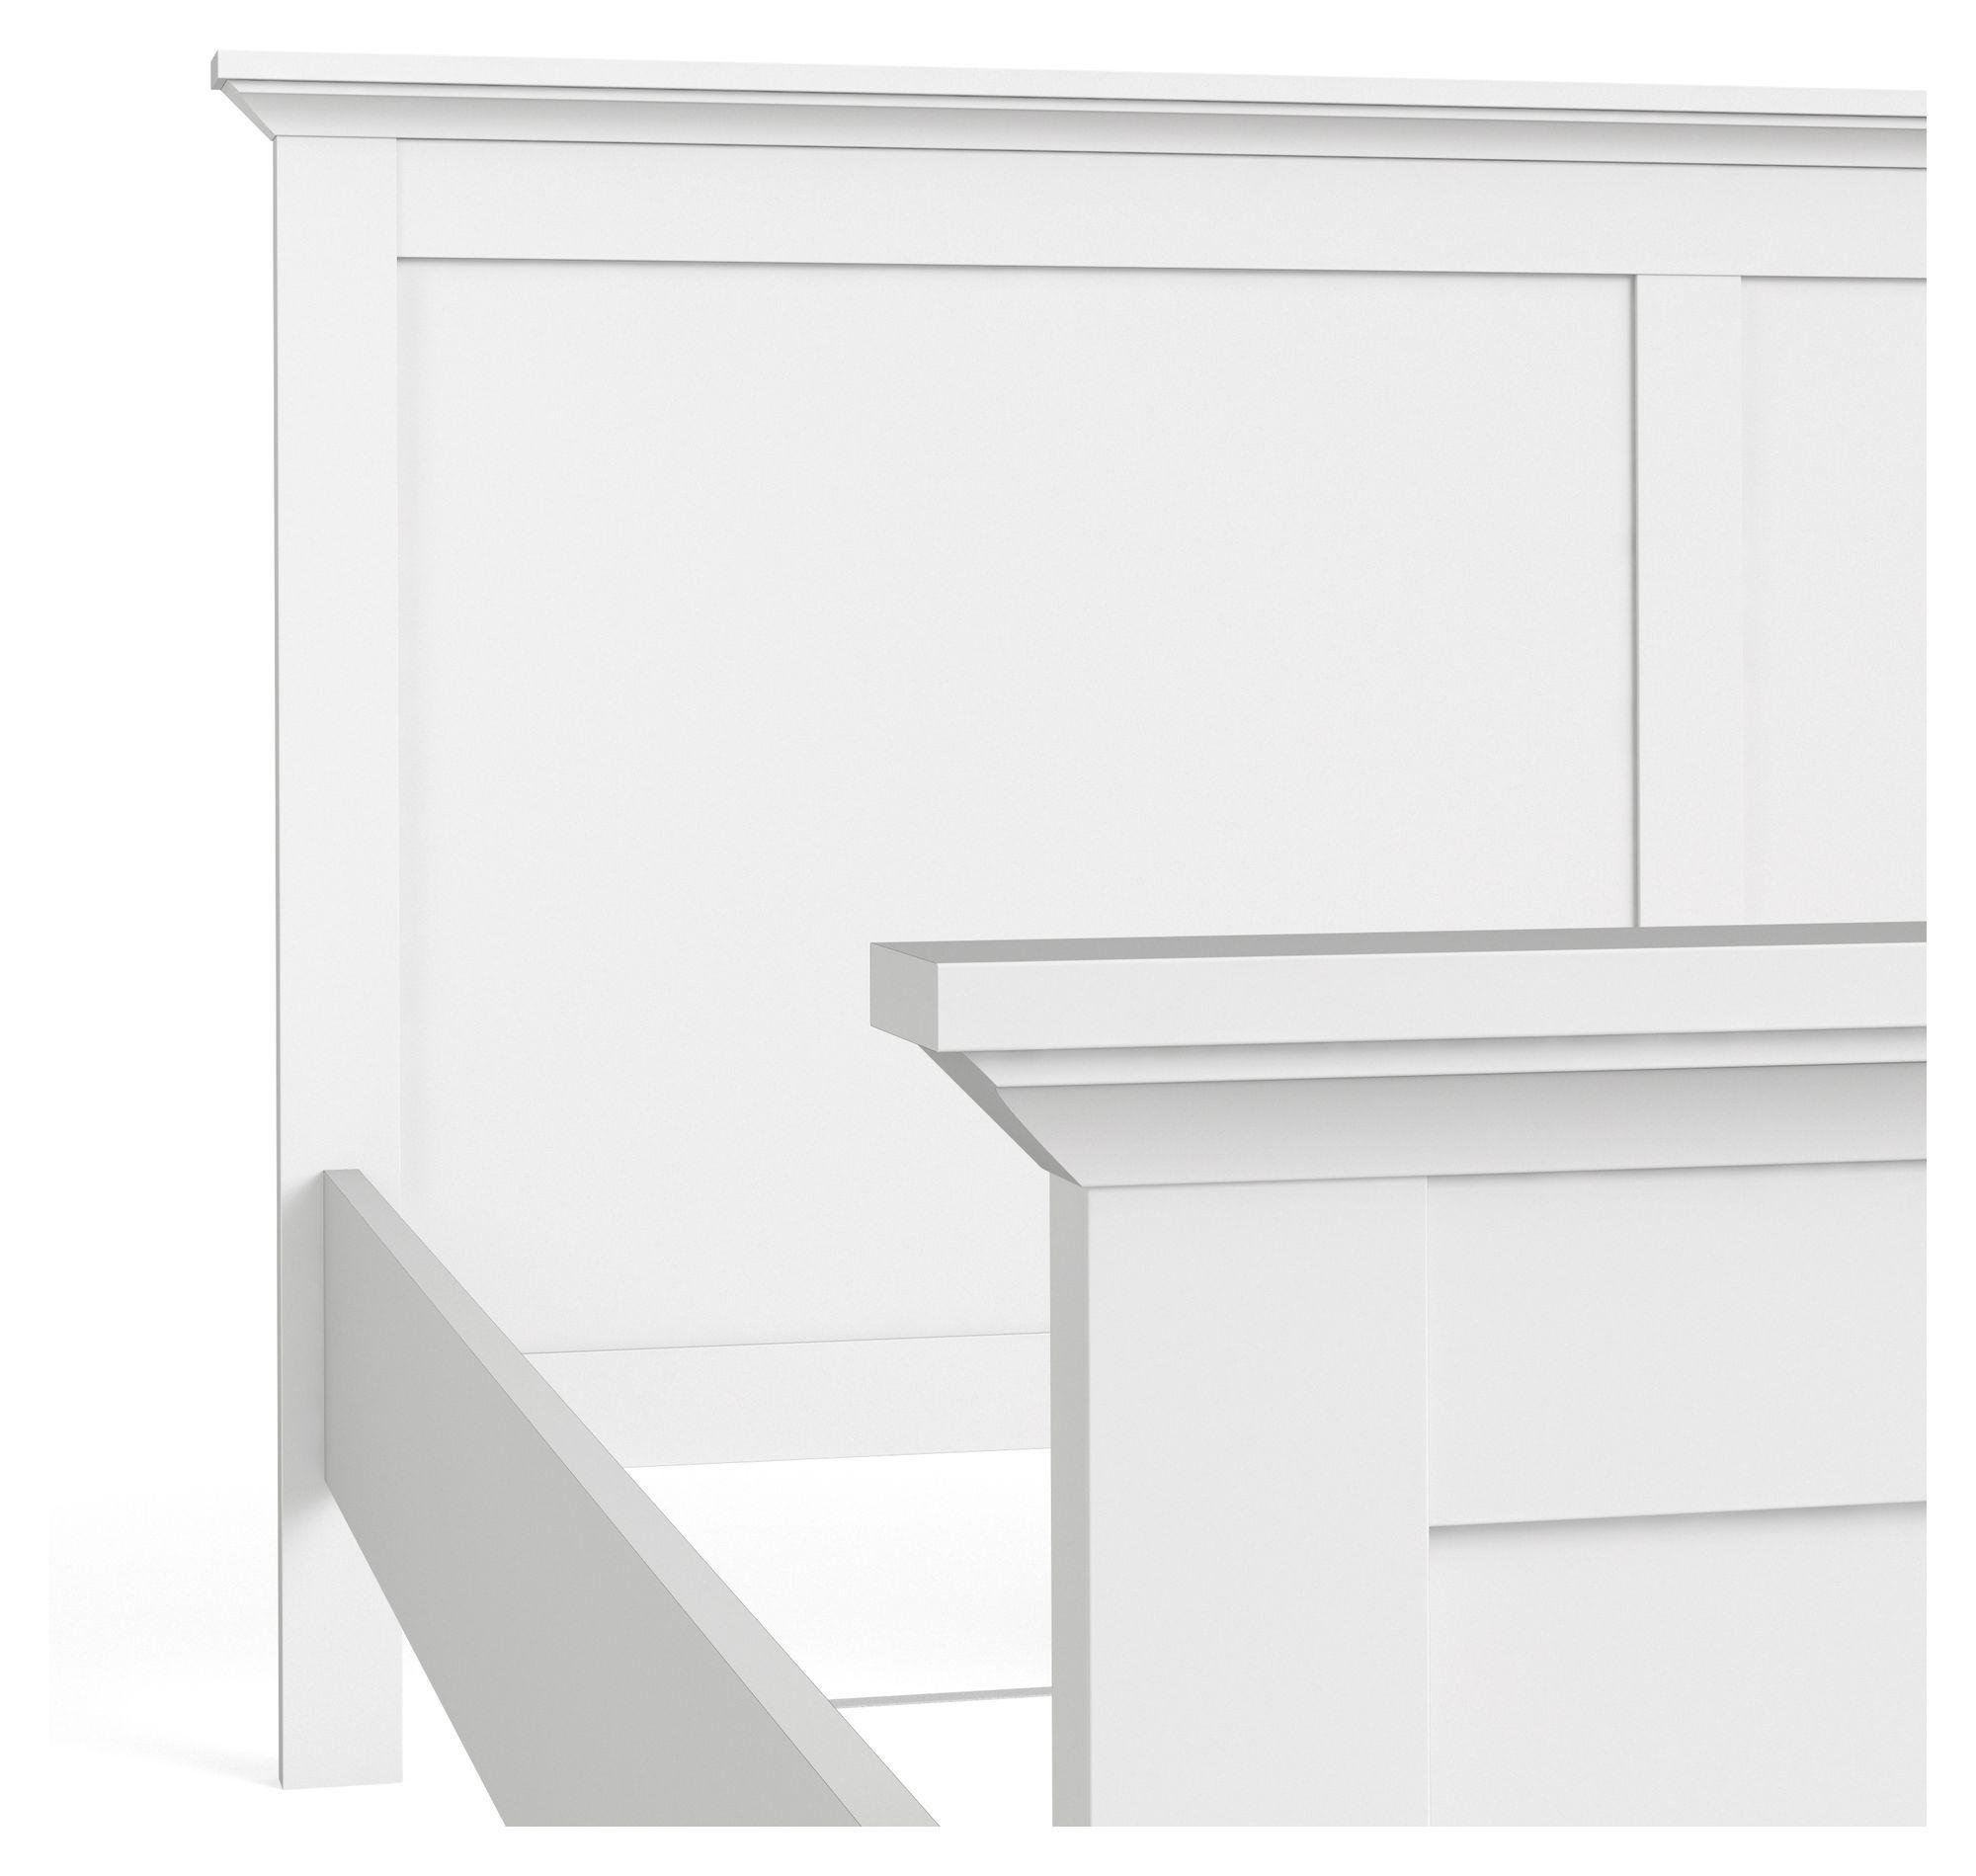 Paris Sengeramme - Hvid 180x200 - Enkel seng i hvid - 180x200 cm